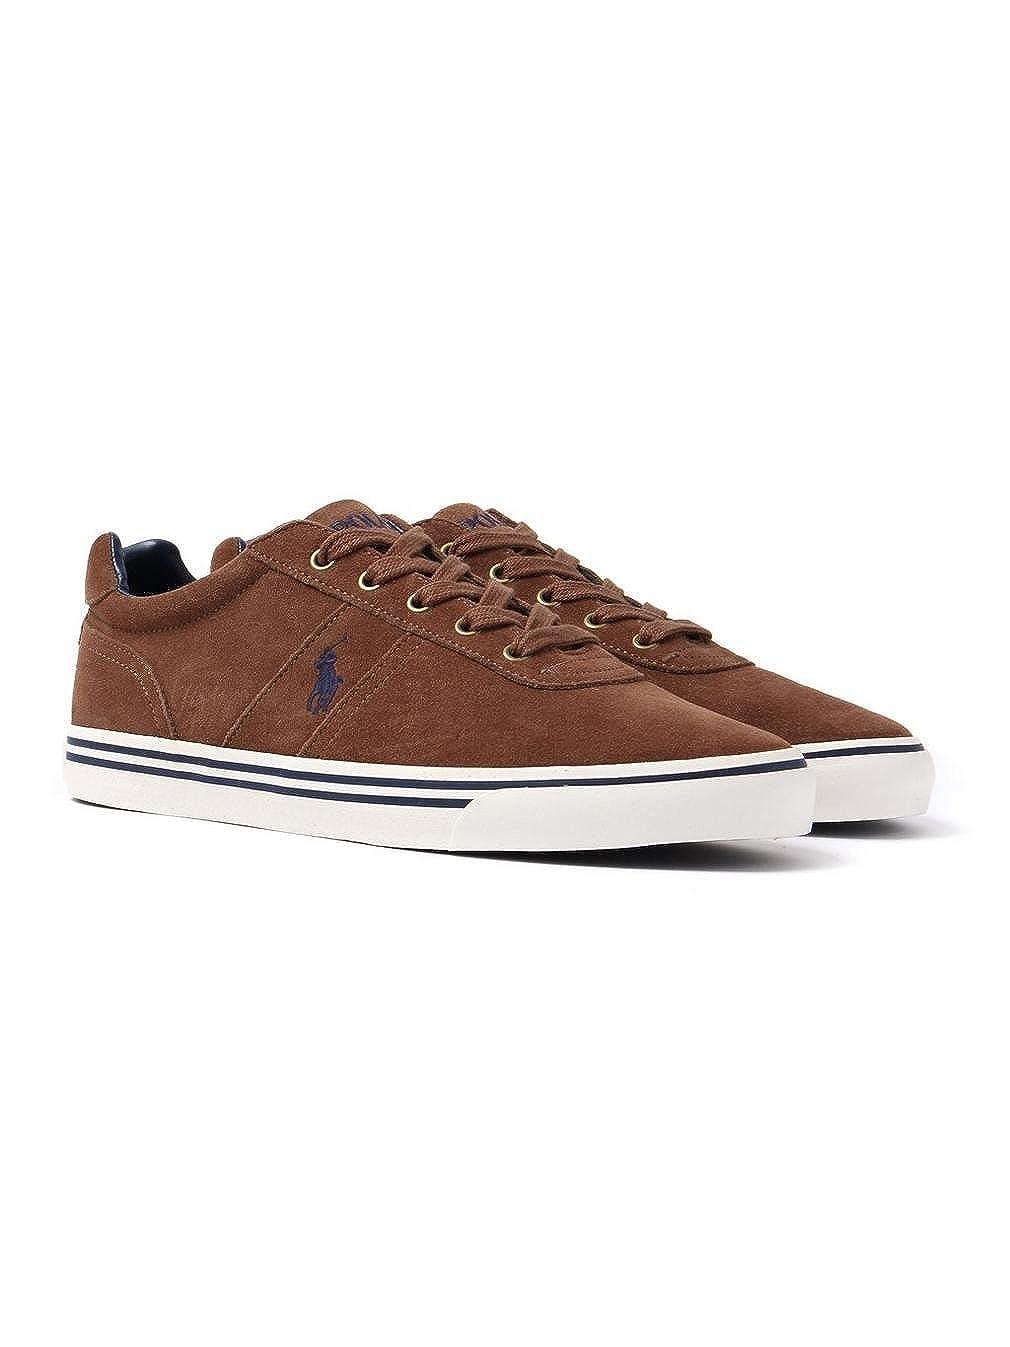 Polo Ralph Lauren HANFORD Blau Schuhe Sneaker Low Herren 78